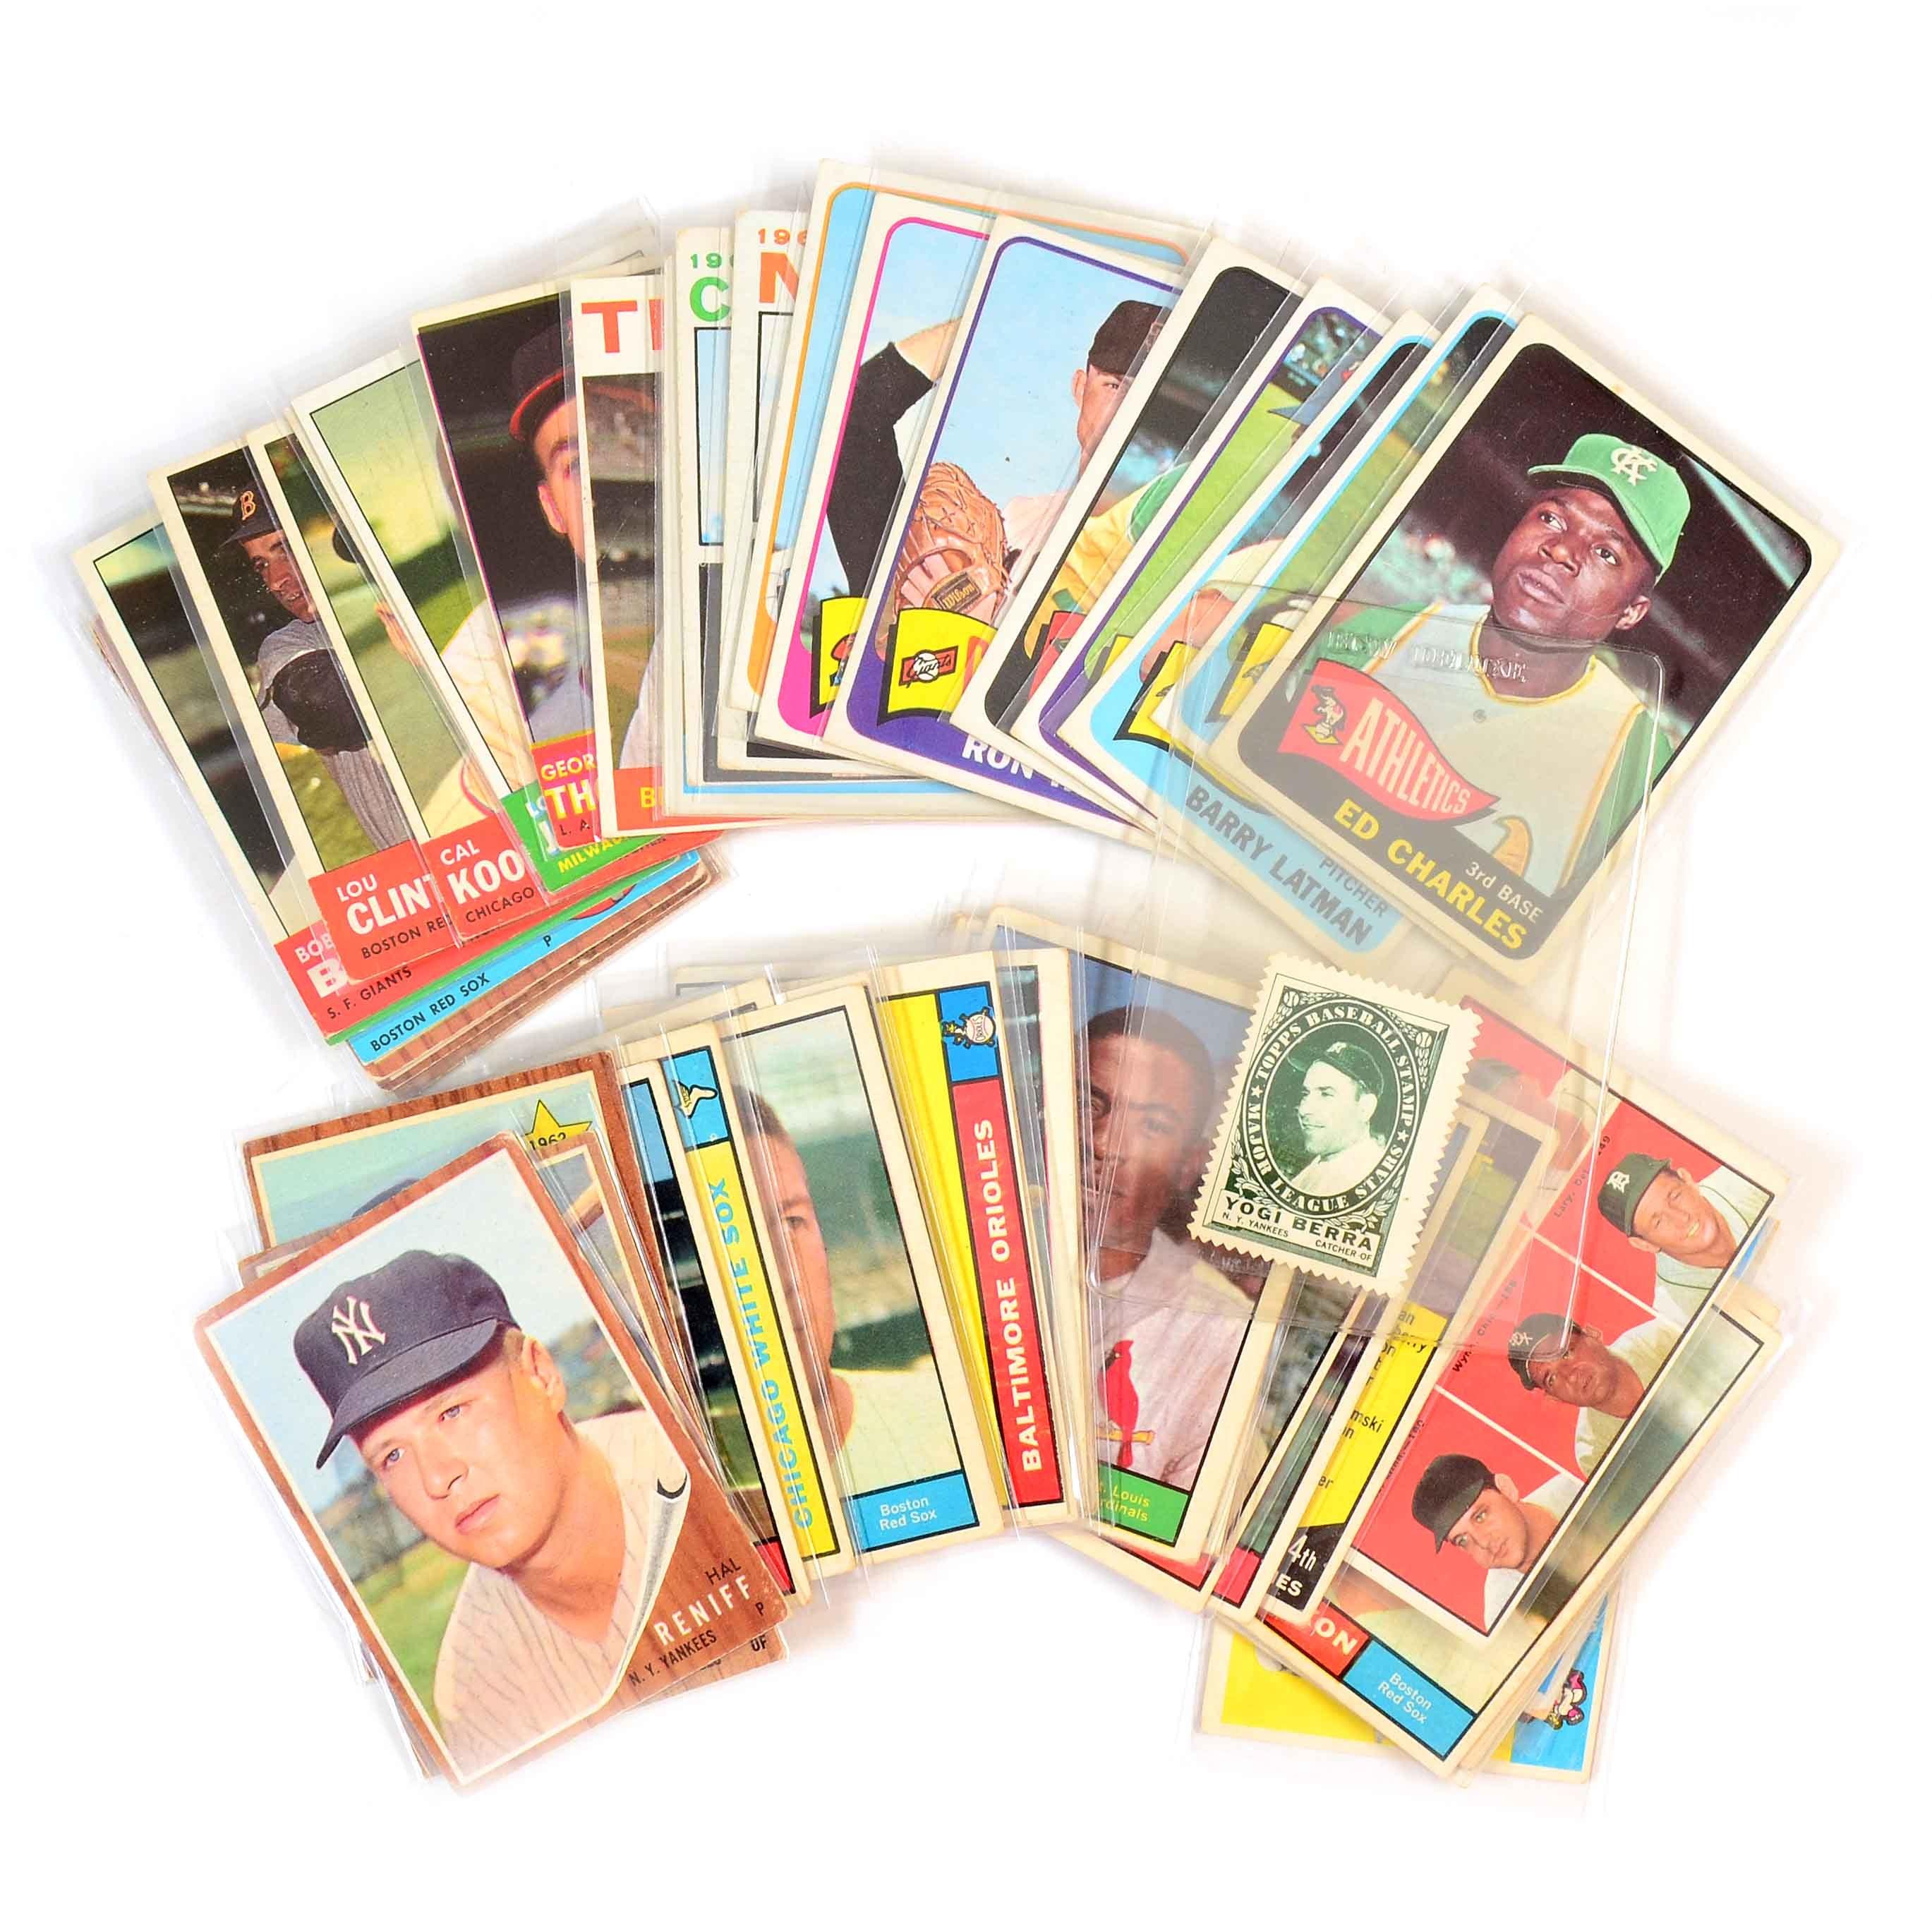 1960s Topps Baseball Cards and '61 Berra Stamp